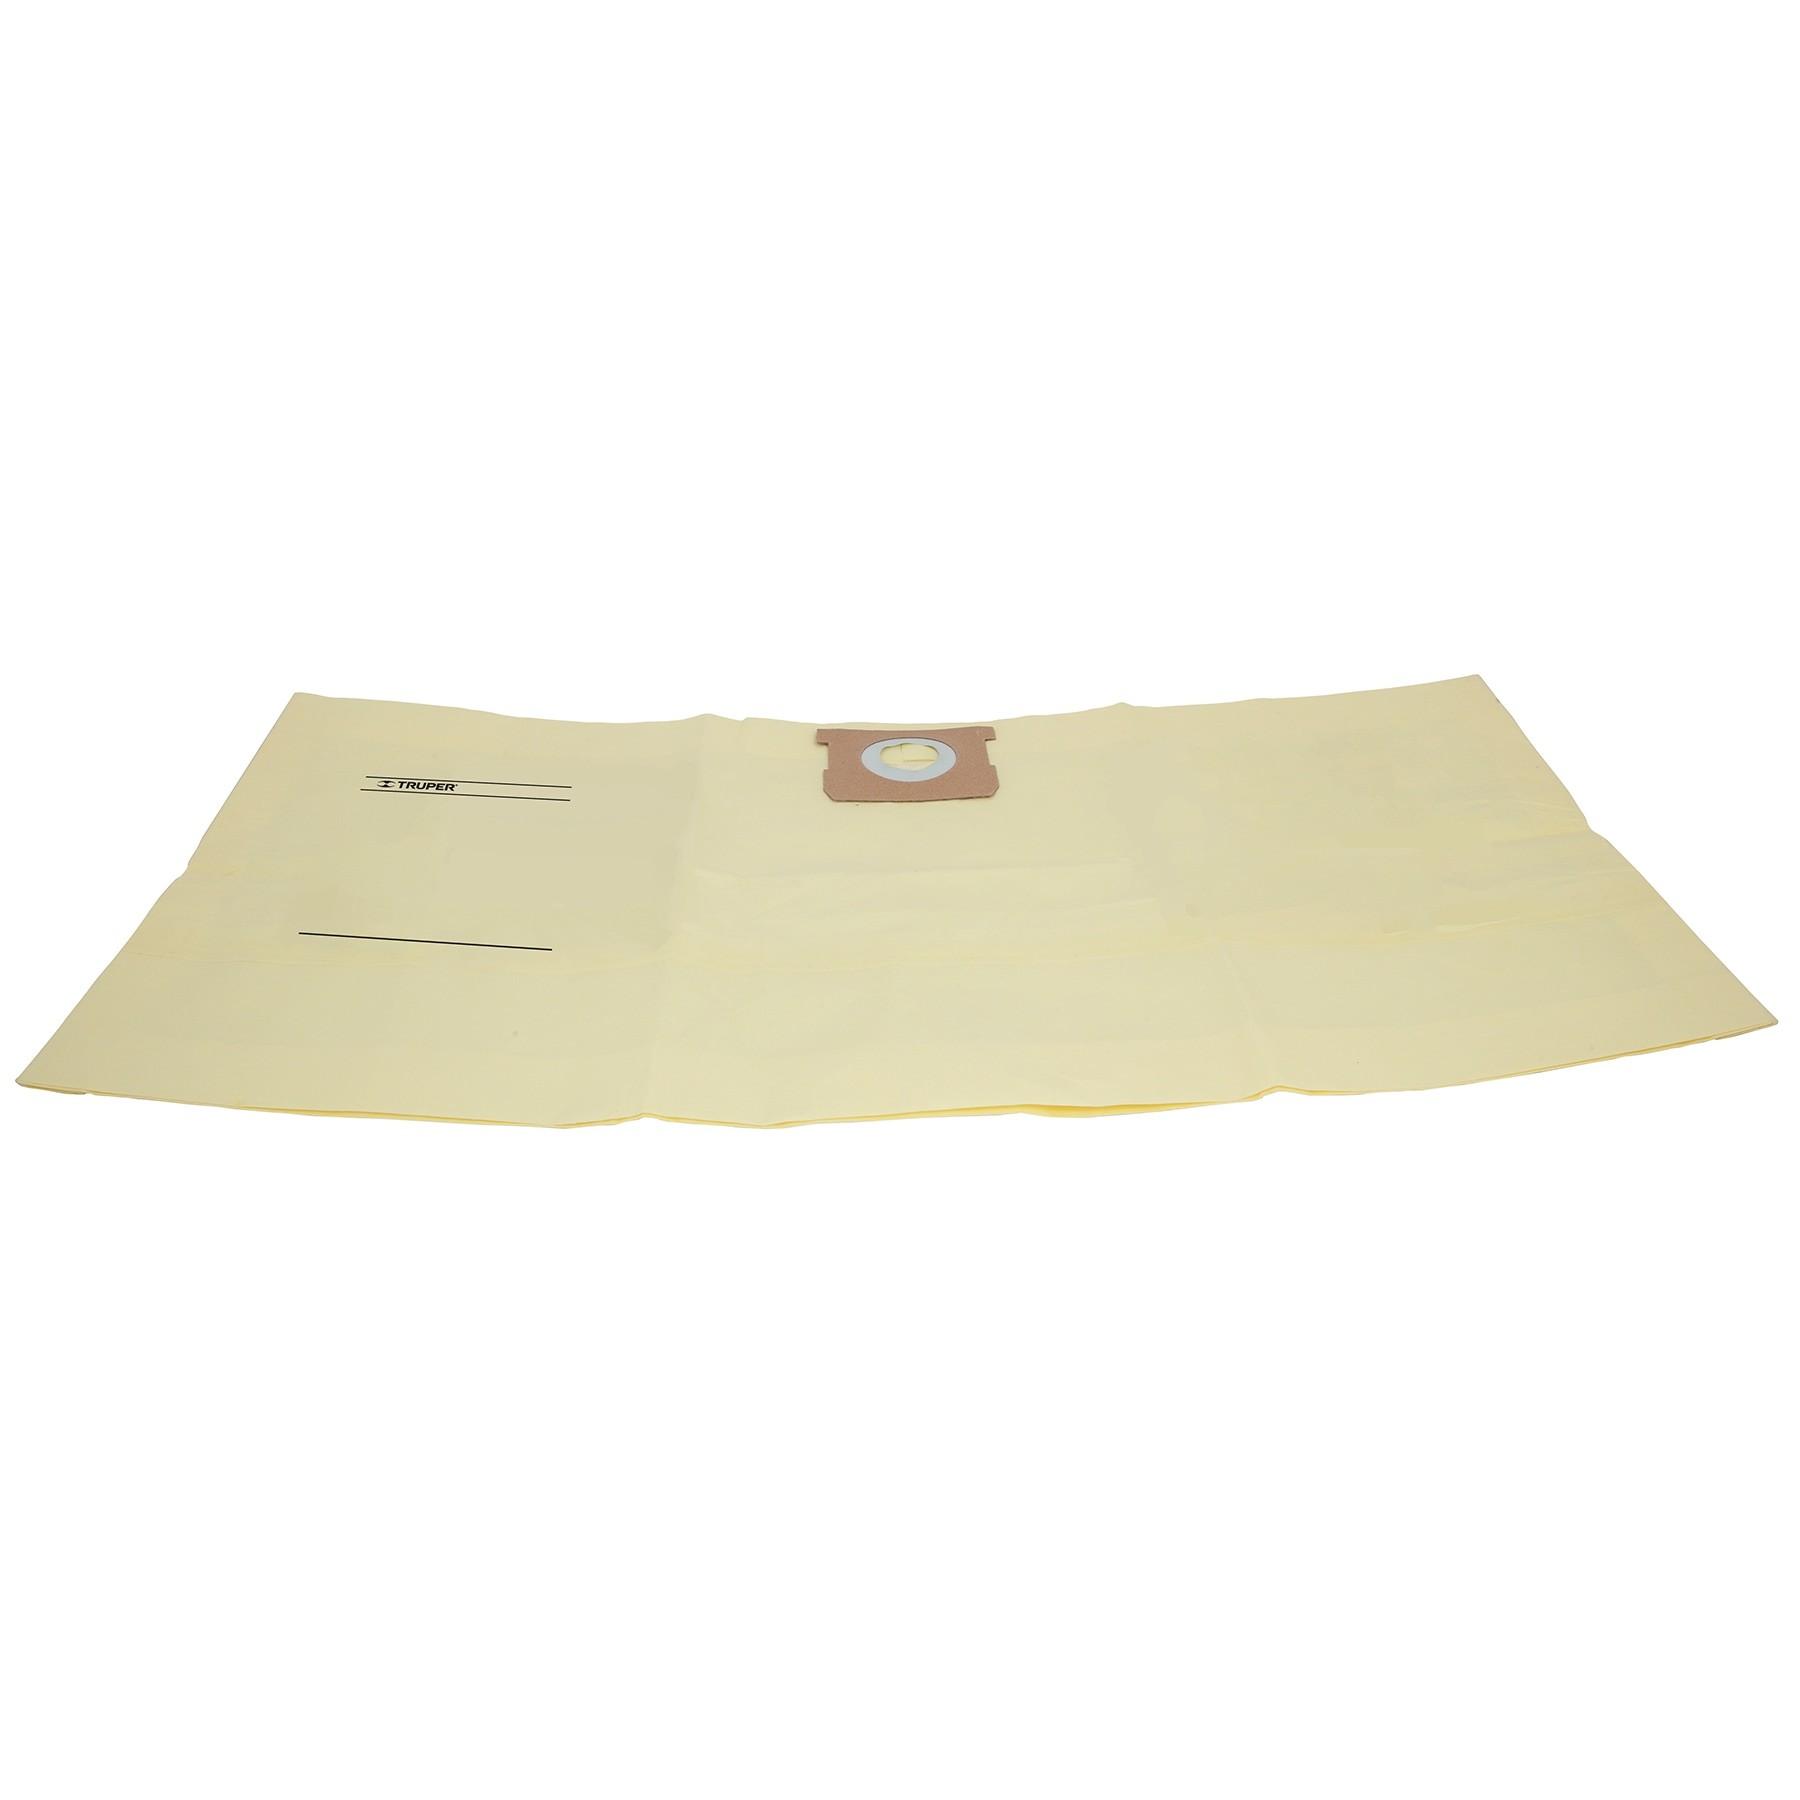 Filtro de papel para aspiradora ASPI-08X